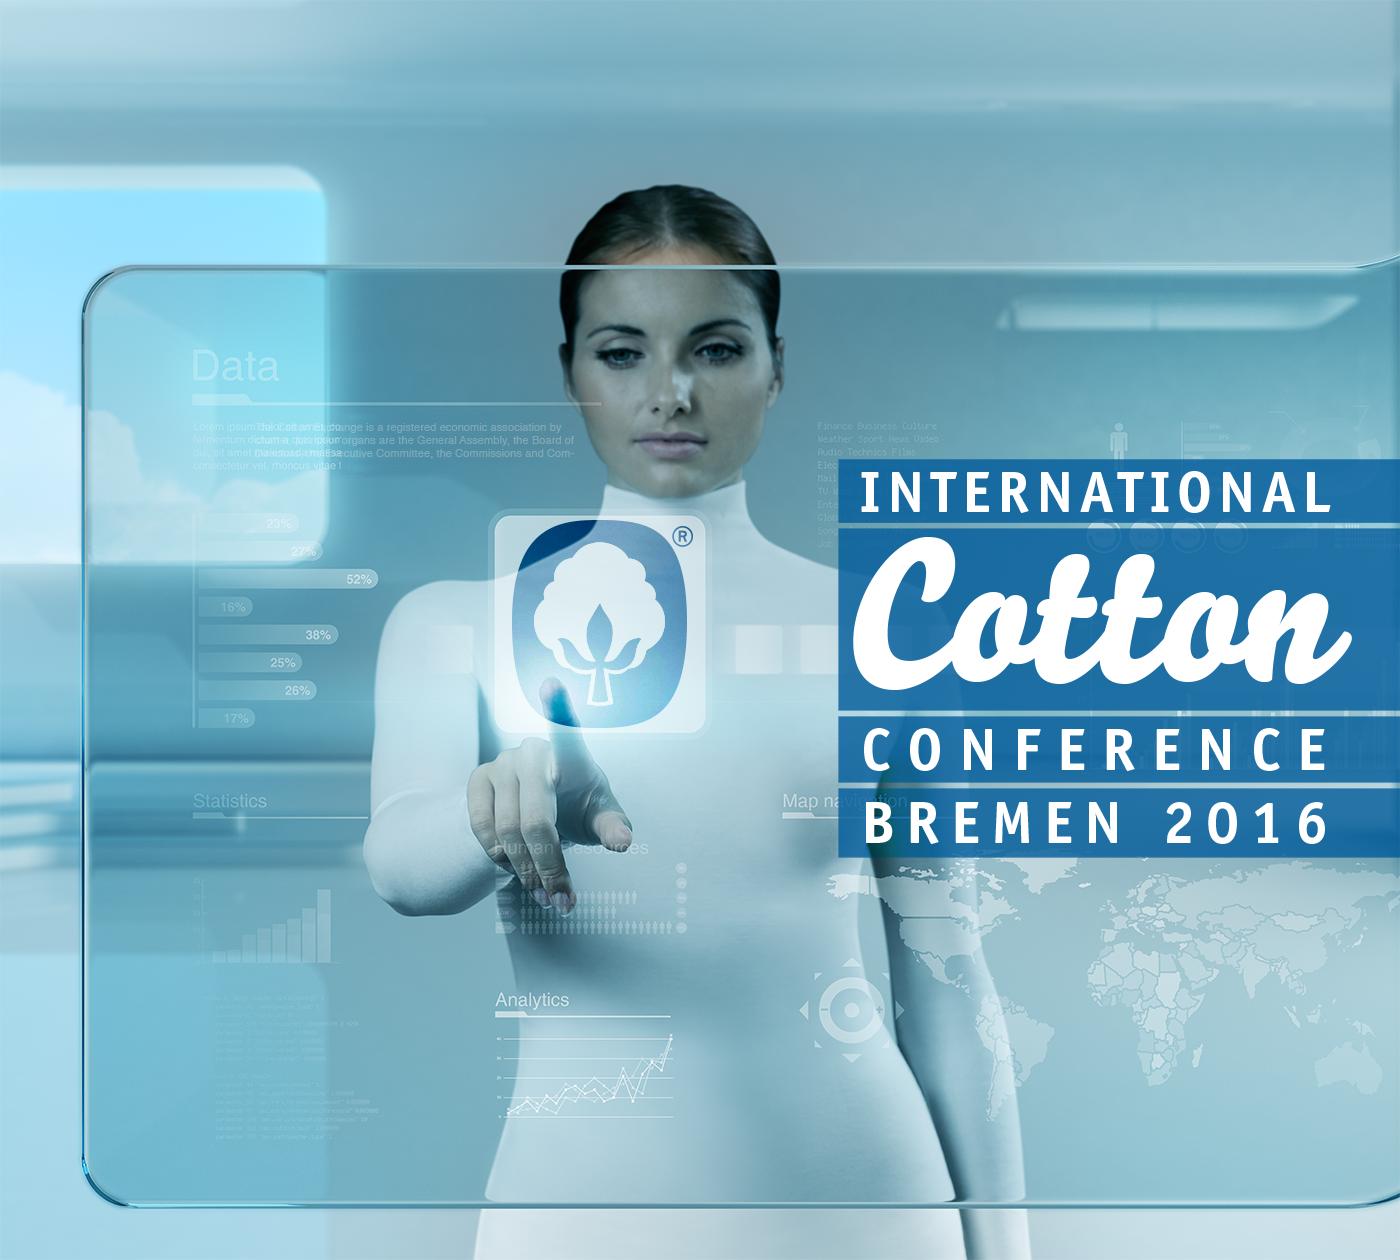 eskalade Bremer Baumwollbörse Cotton Conference 2016